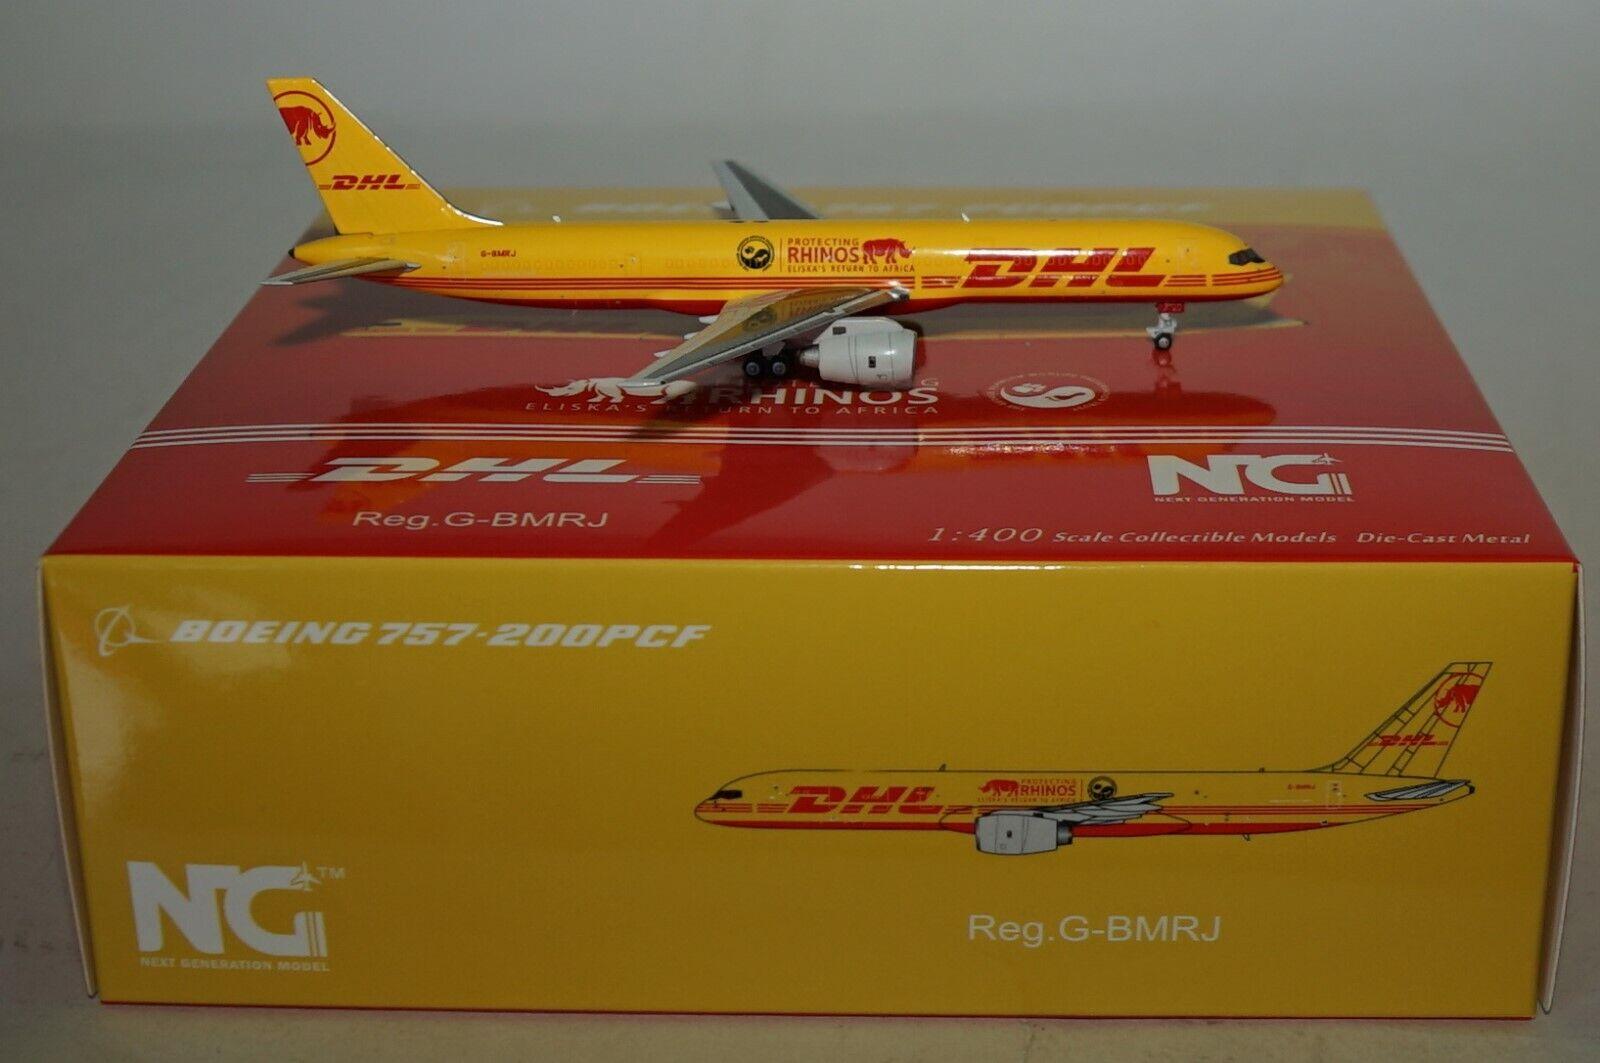 NG Model 53070 Boeing 757-236(Sf) DHL Schützt Rhinos G-Bmrj in 1 400 Maßstab